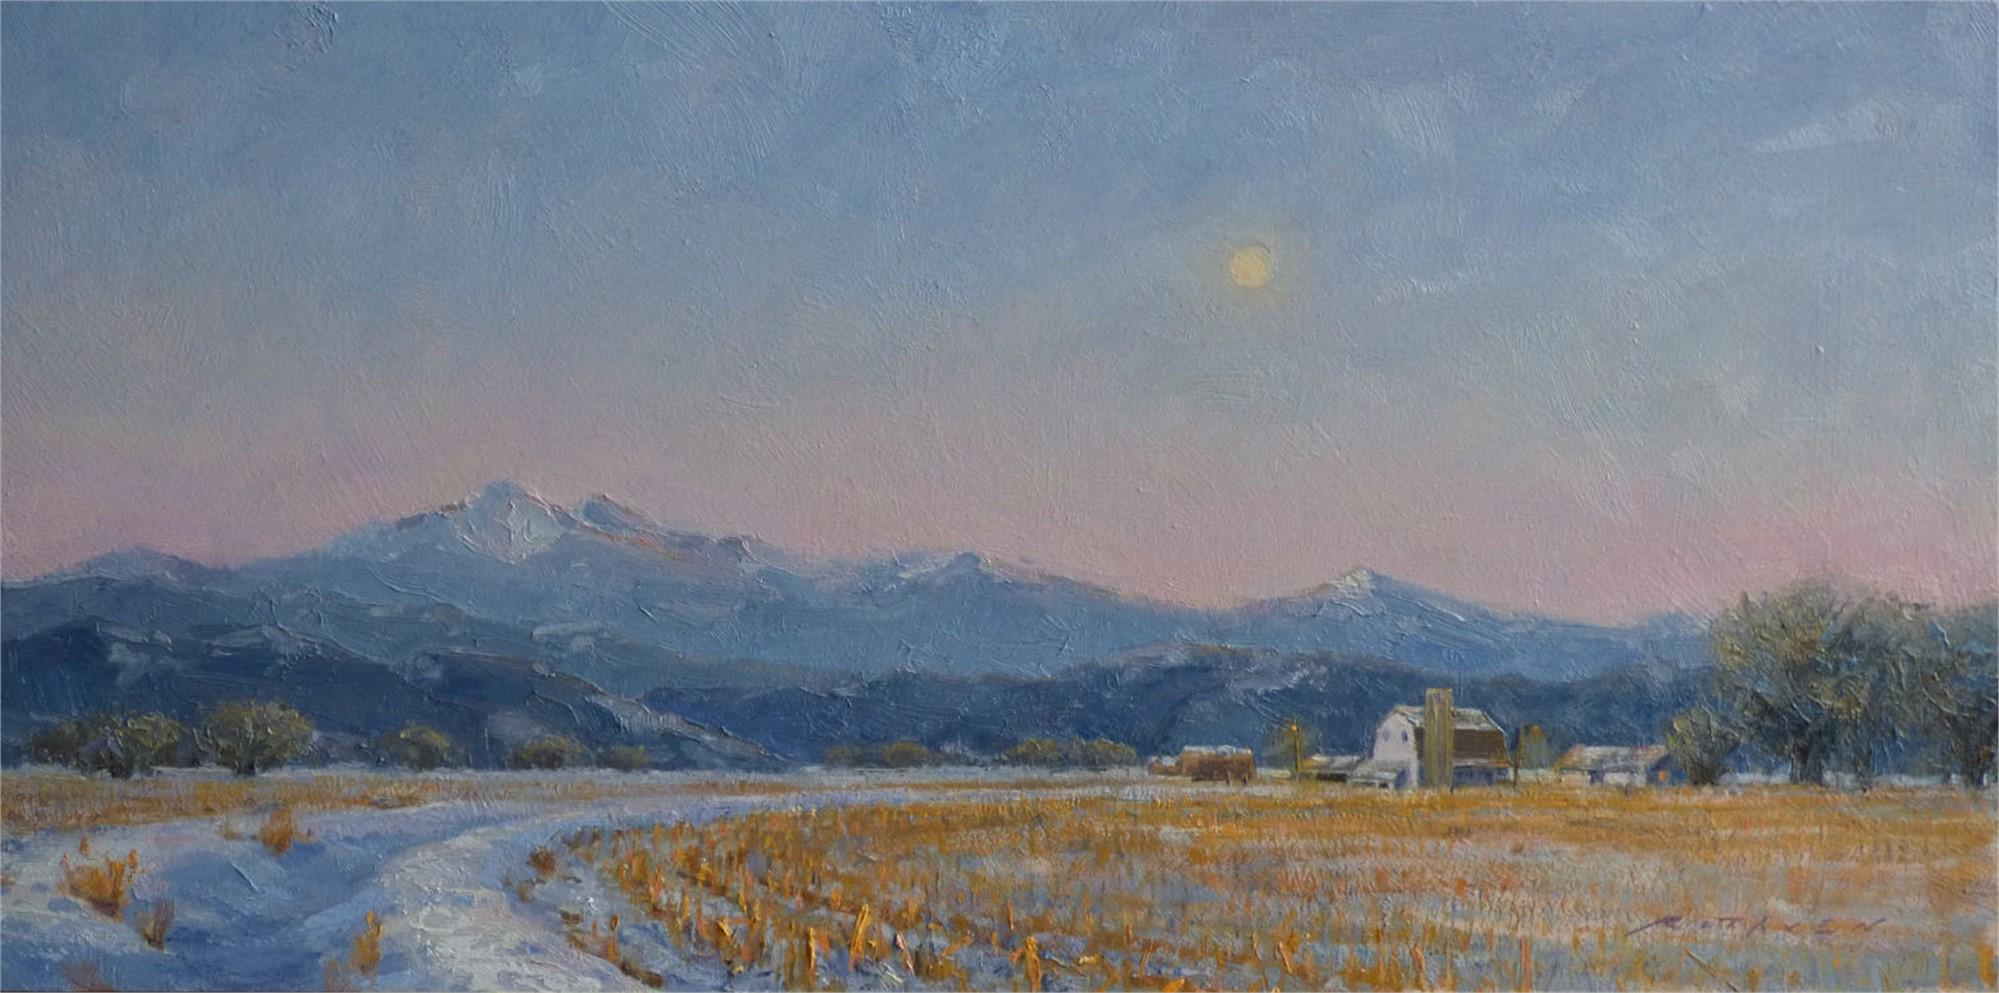 Early Riser by Scott Ruthven